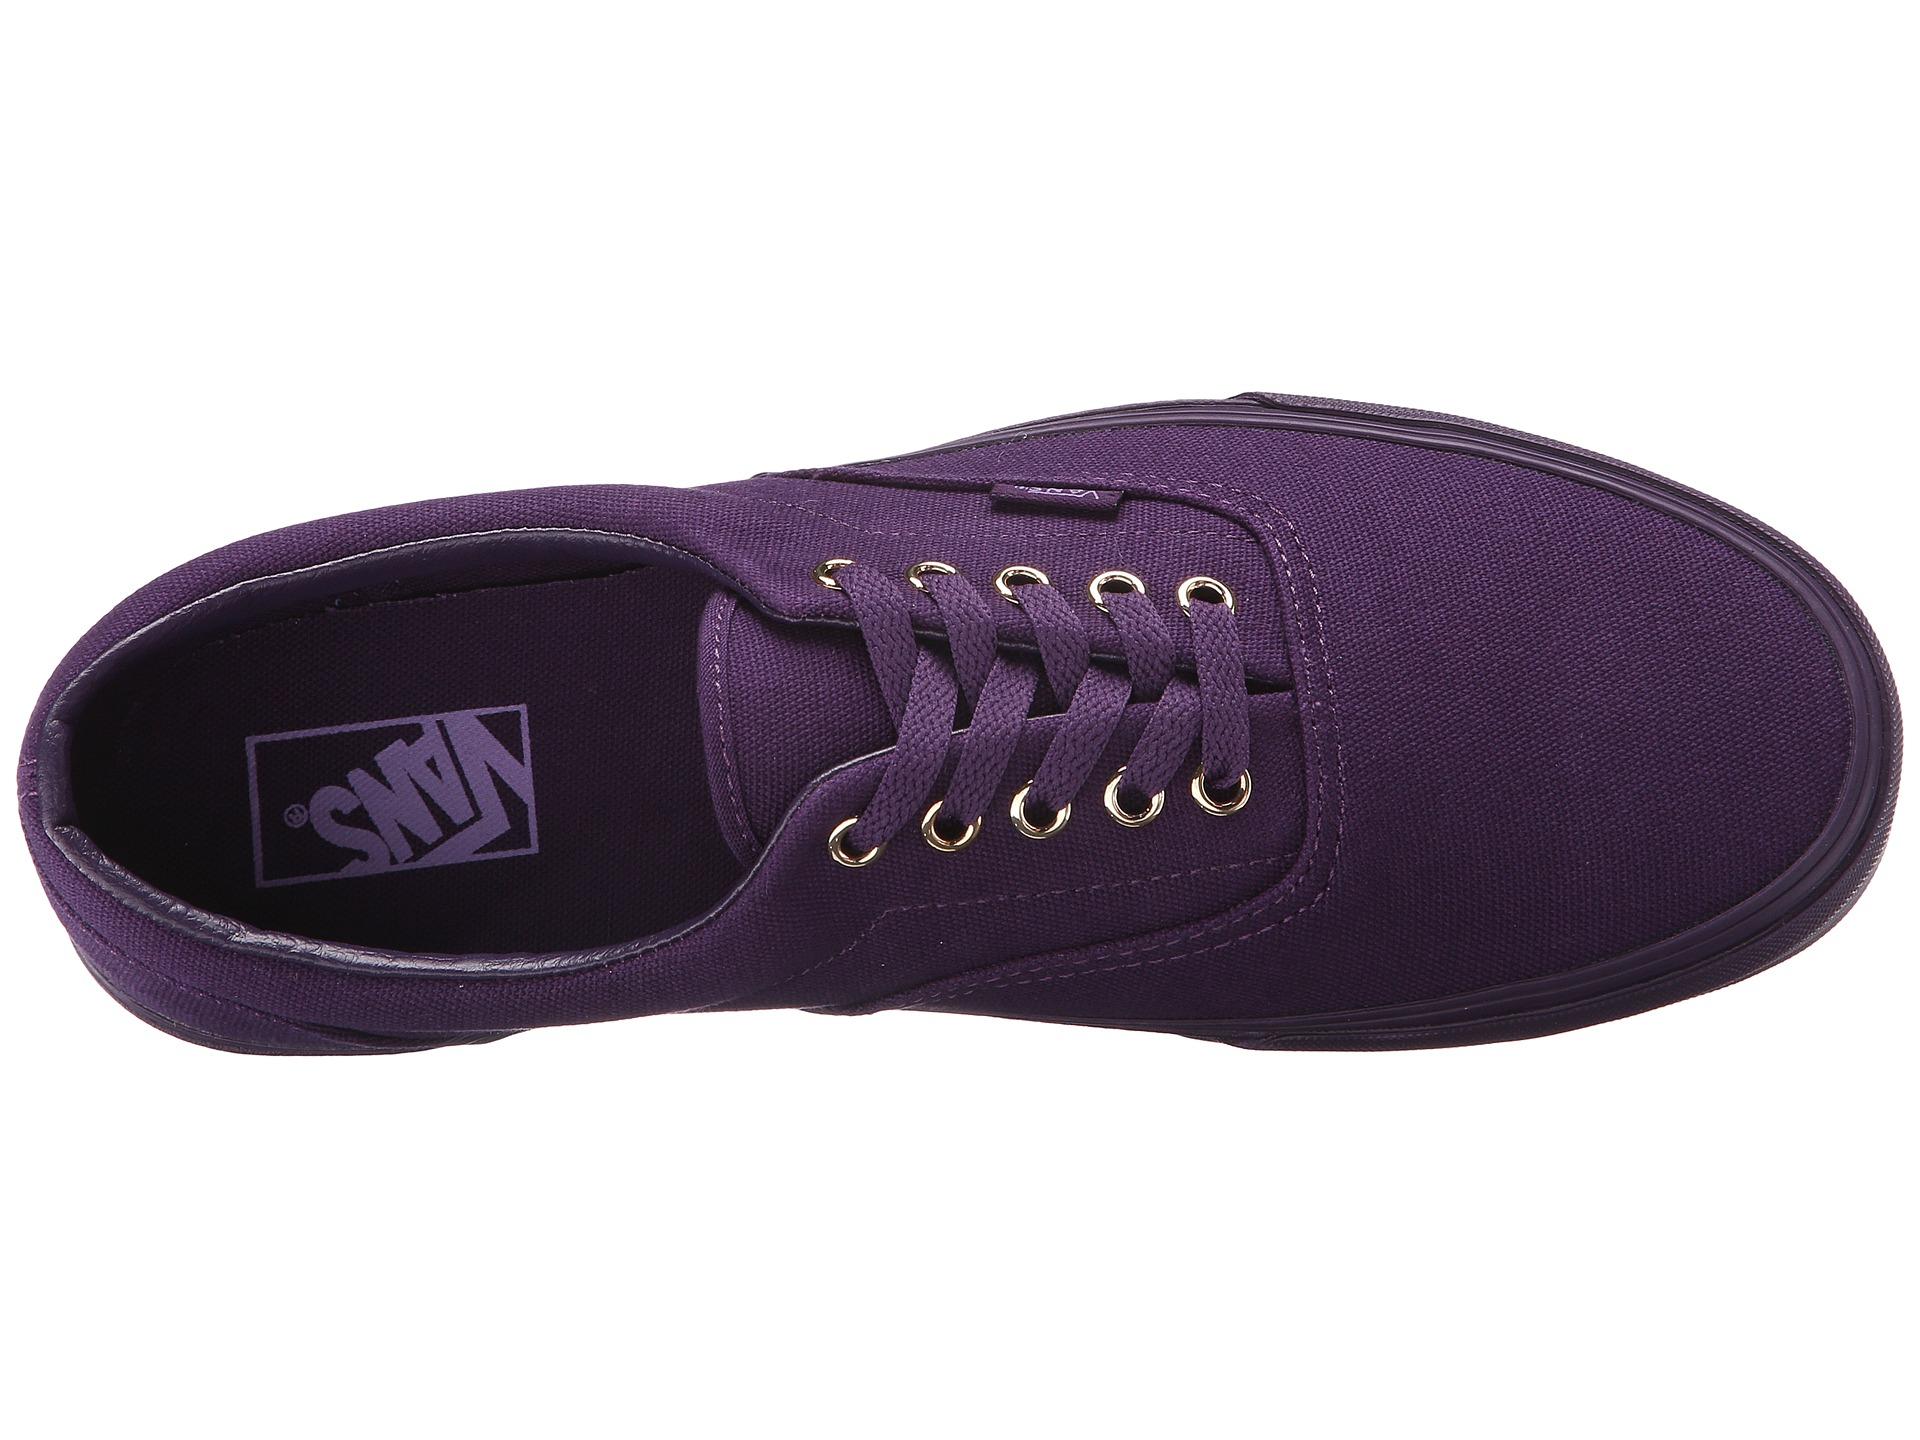 0ff67bddb3 Lyst - Vans Era™ in Purple